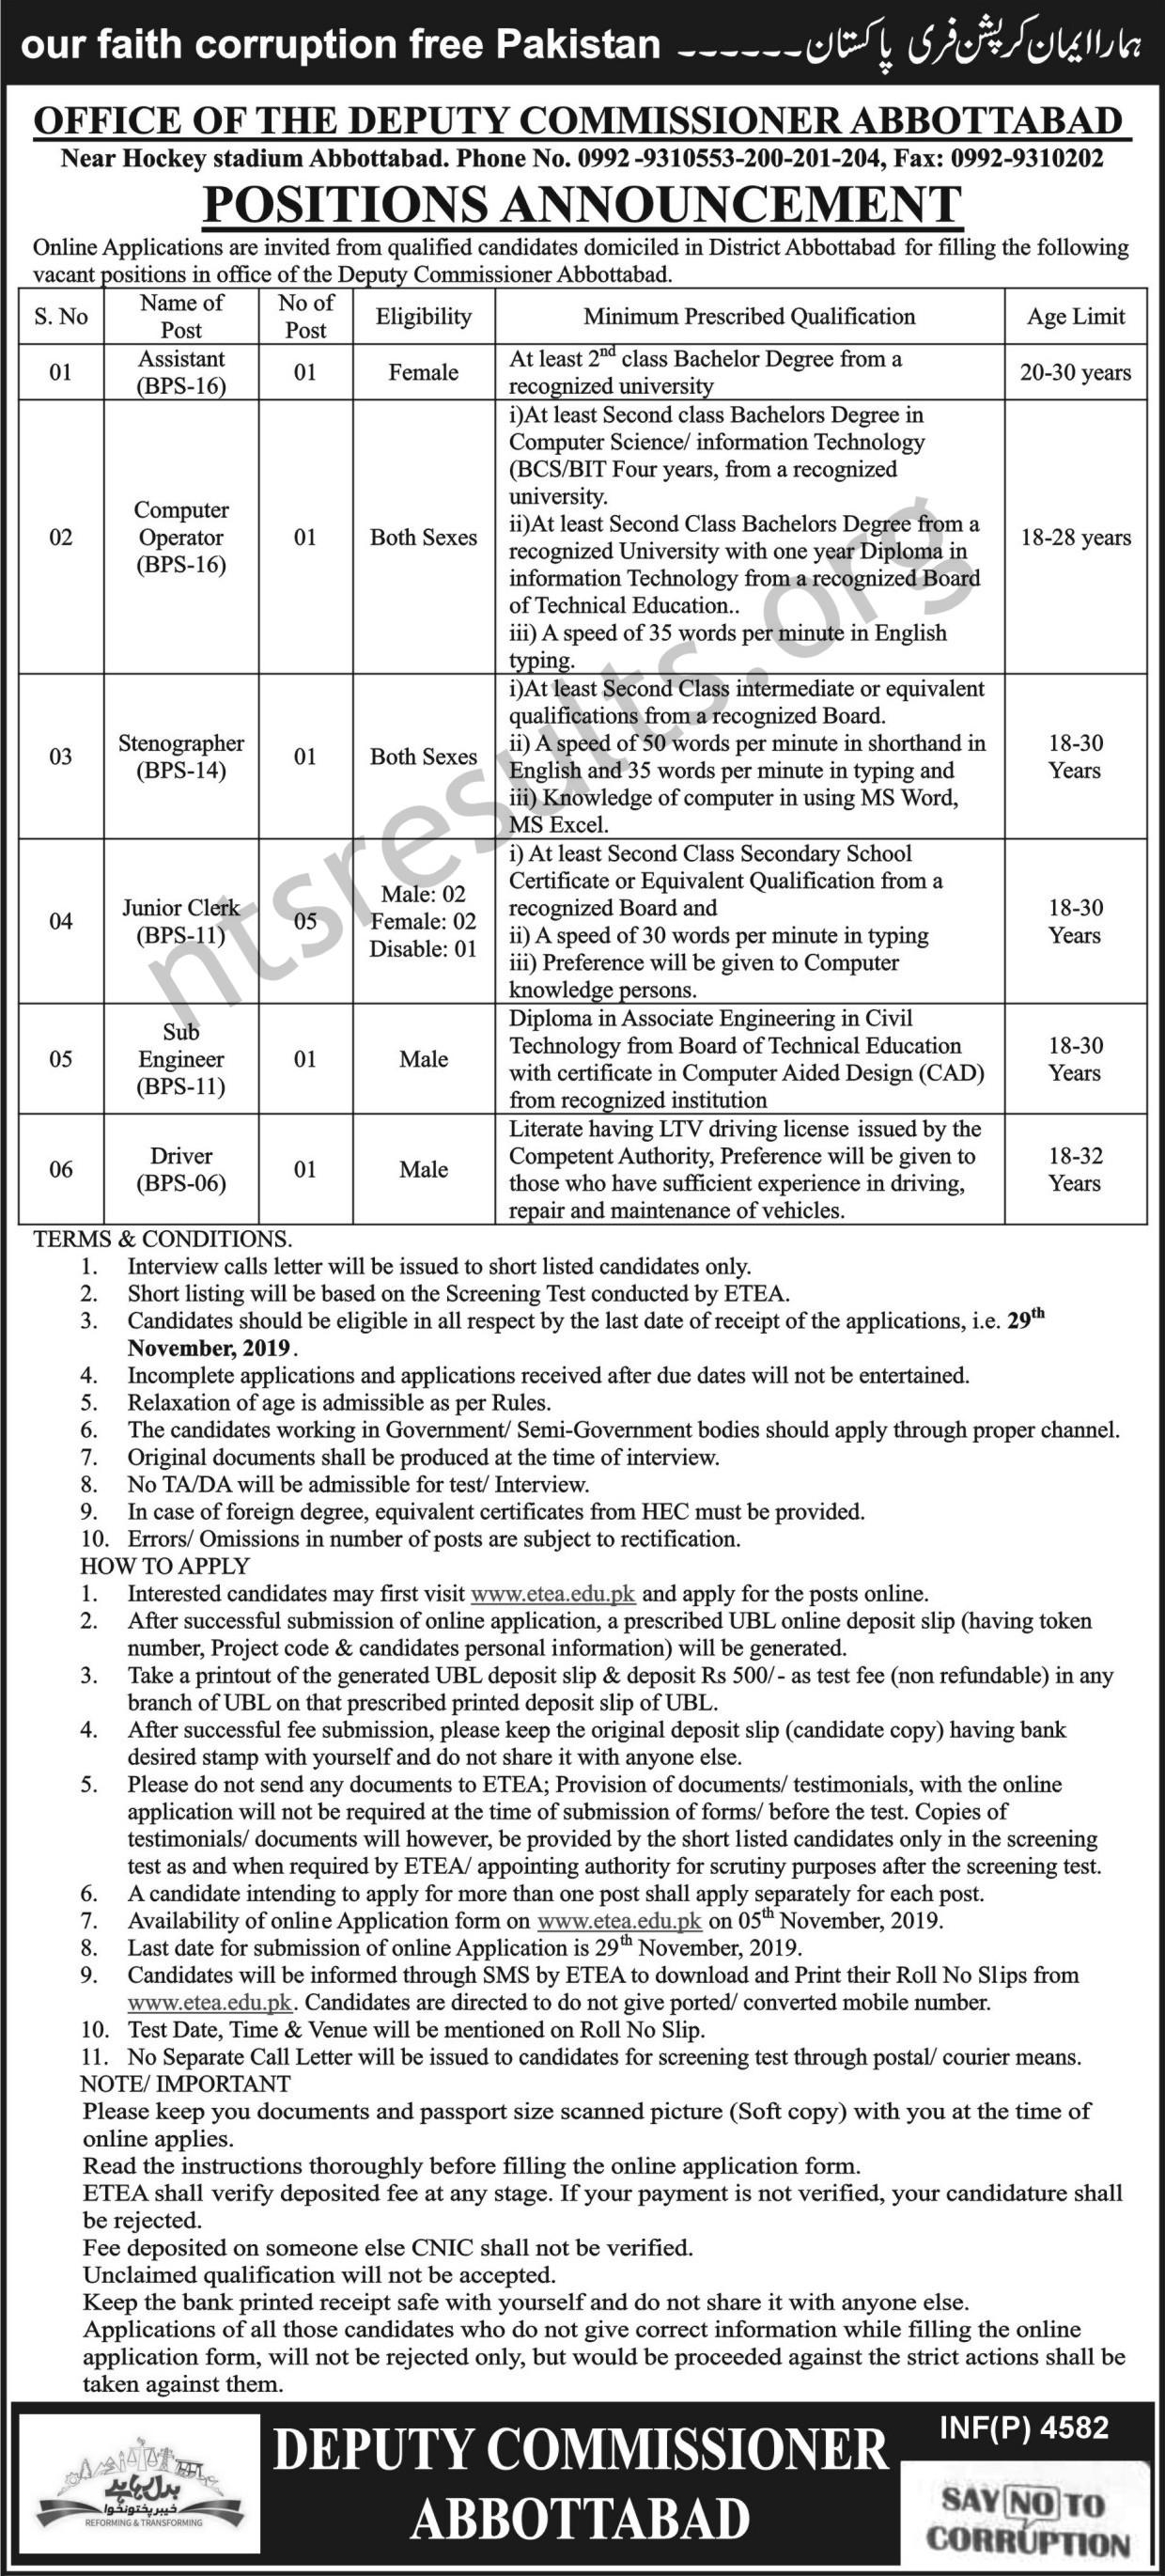 Deputy Commissioner Office Abbottabad Jobs Via ETEA